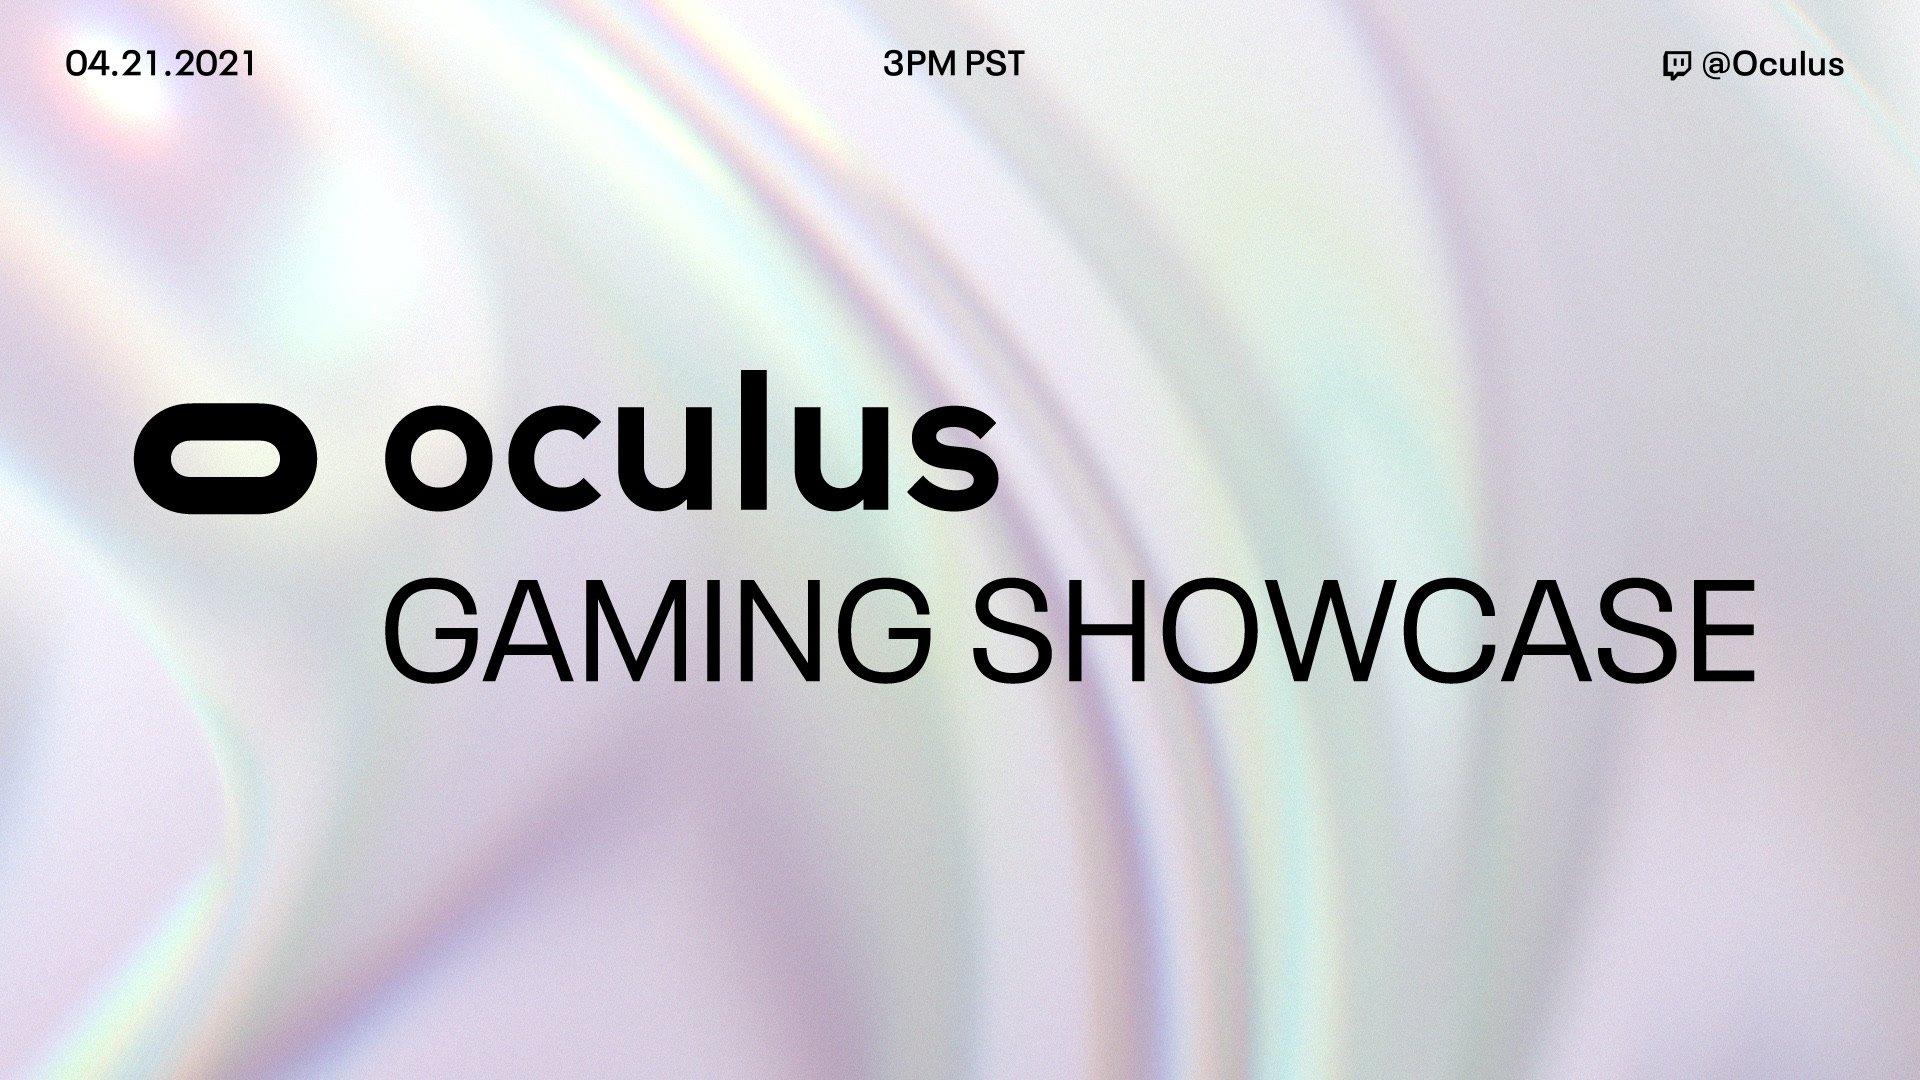 Oculus Gaming Showcase: April 21, 2021